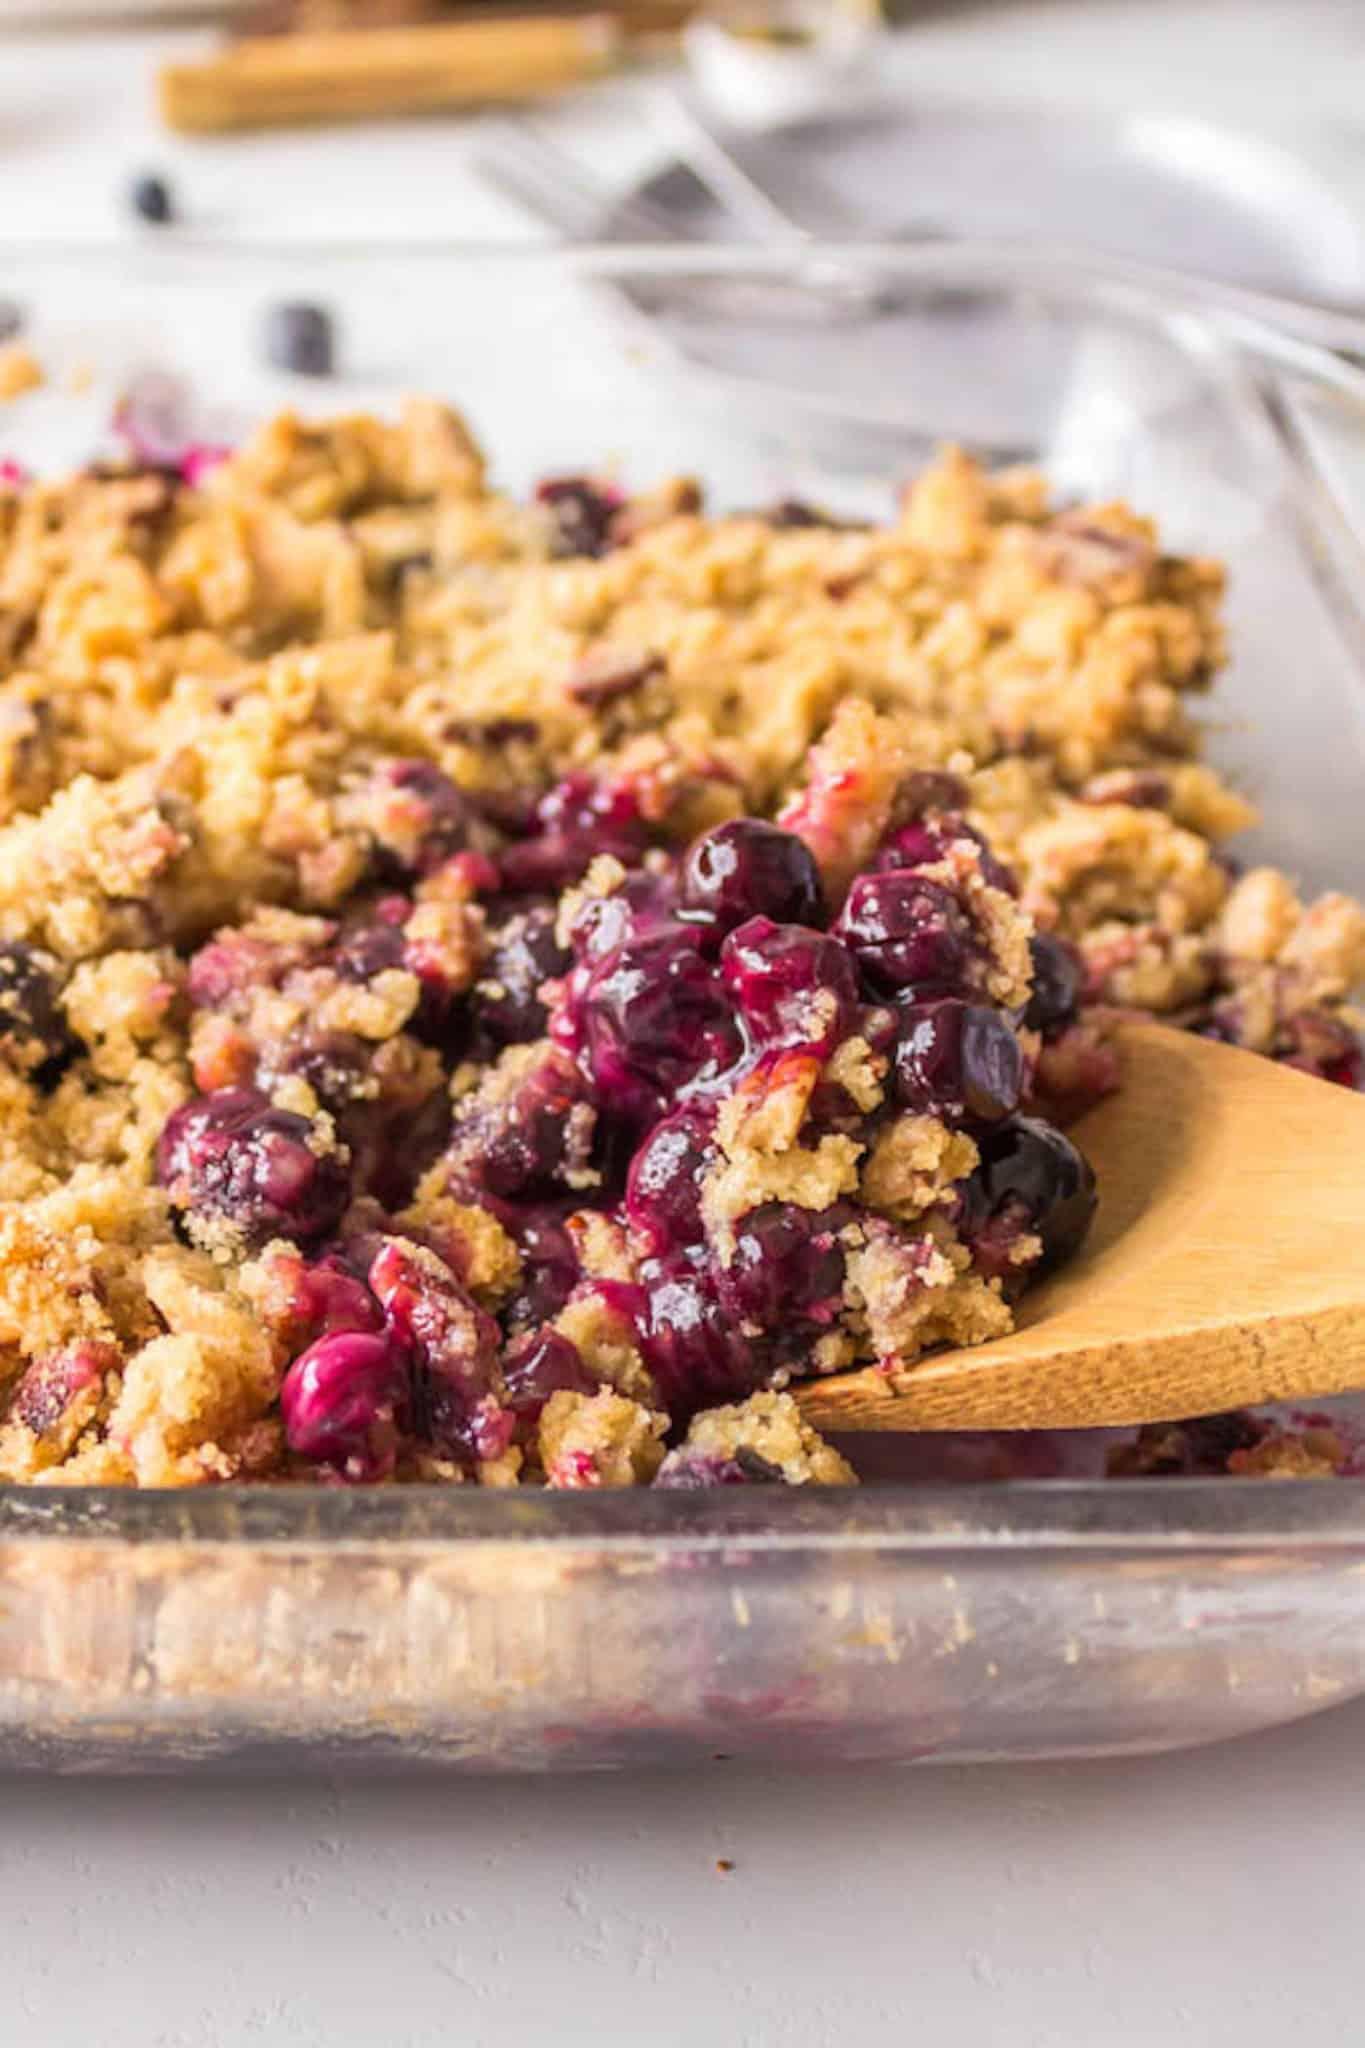 spoonful of blueberry crisp